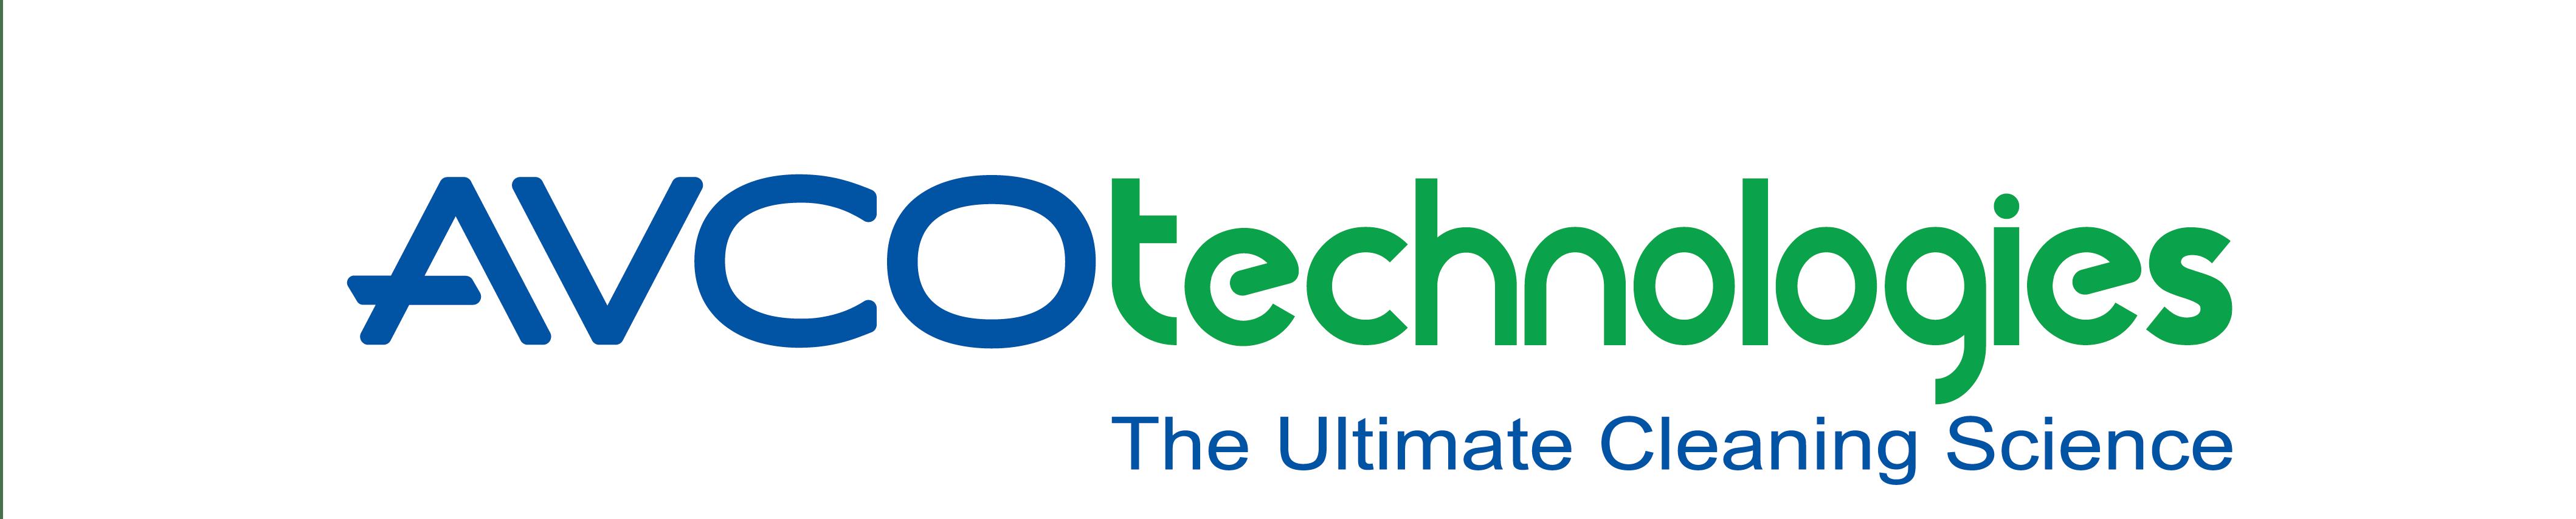 AVCOtechnologies